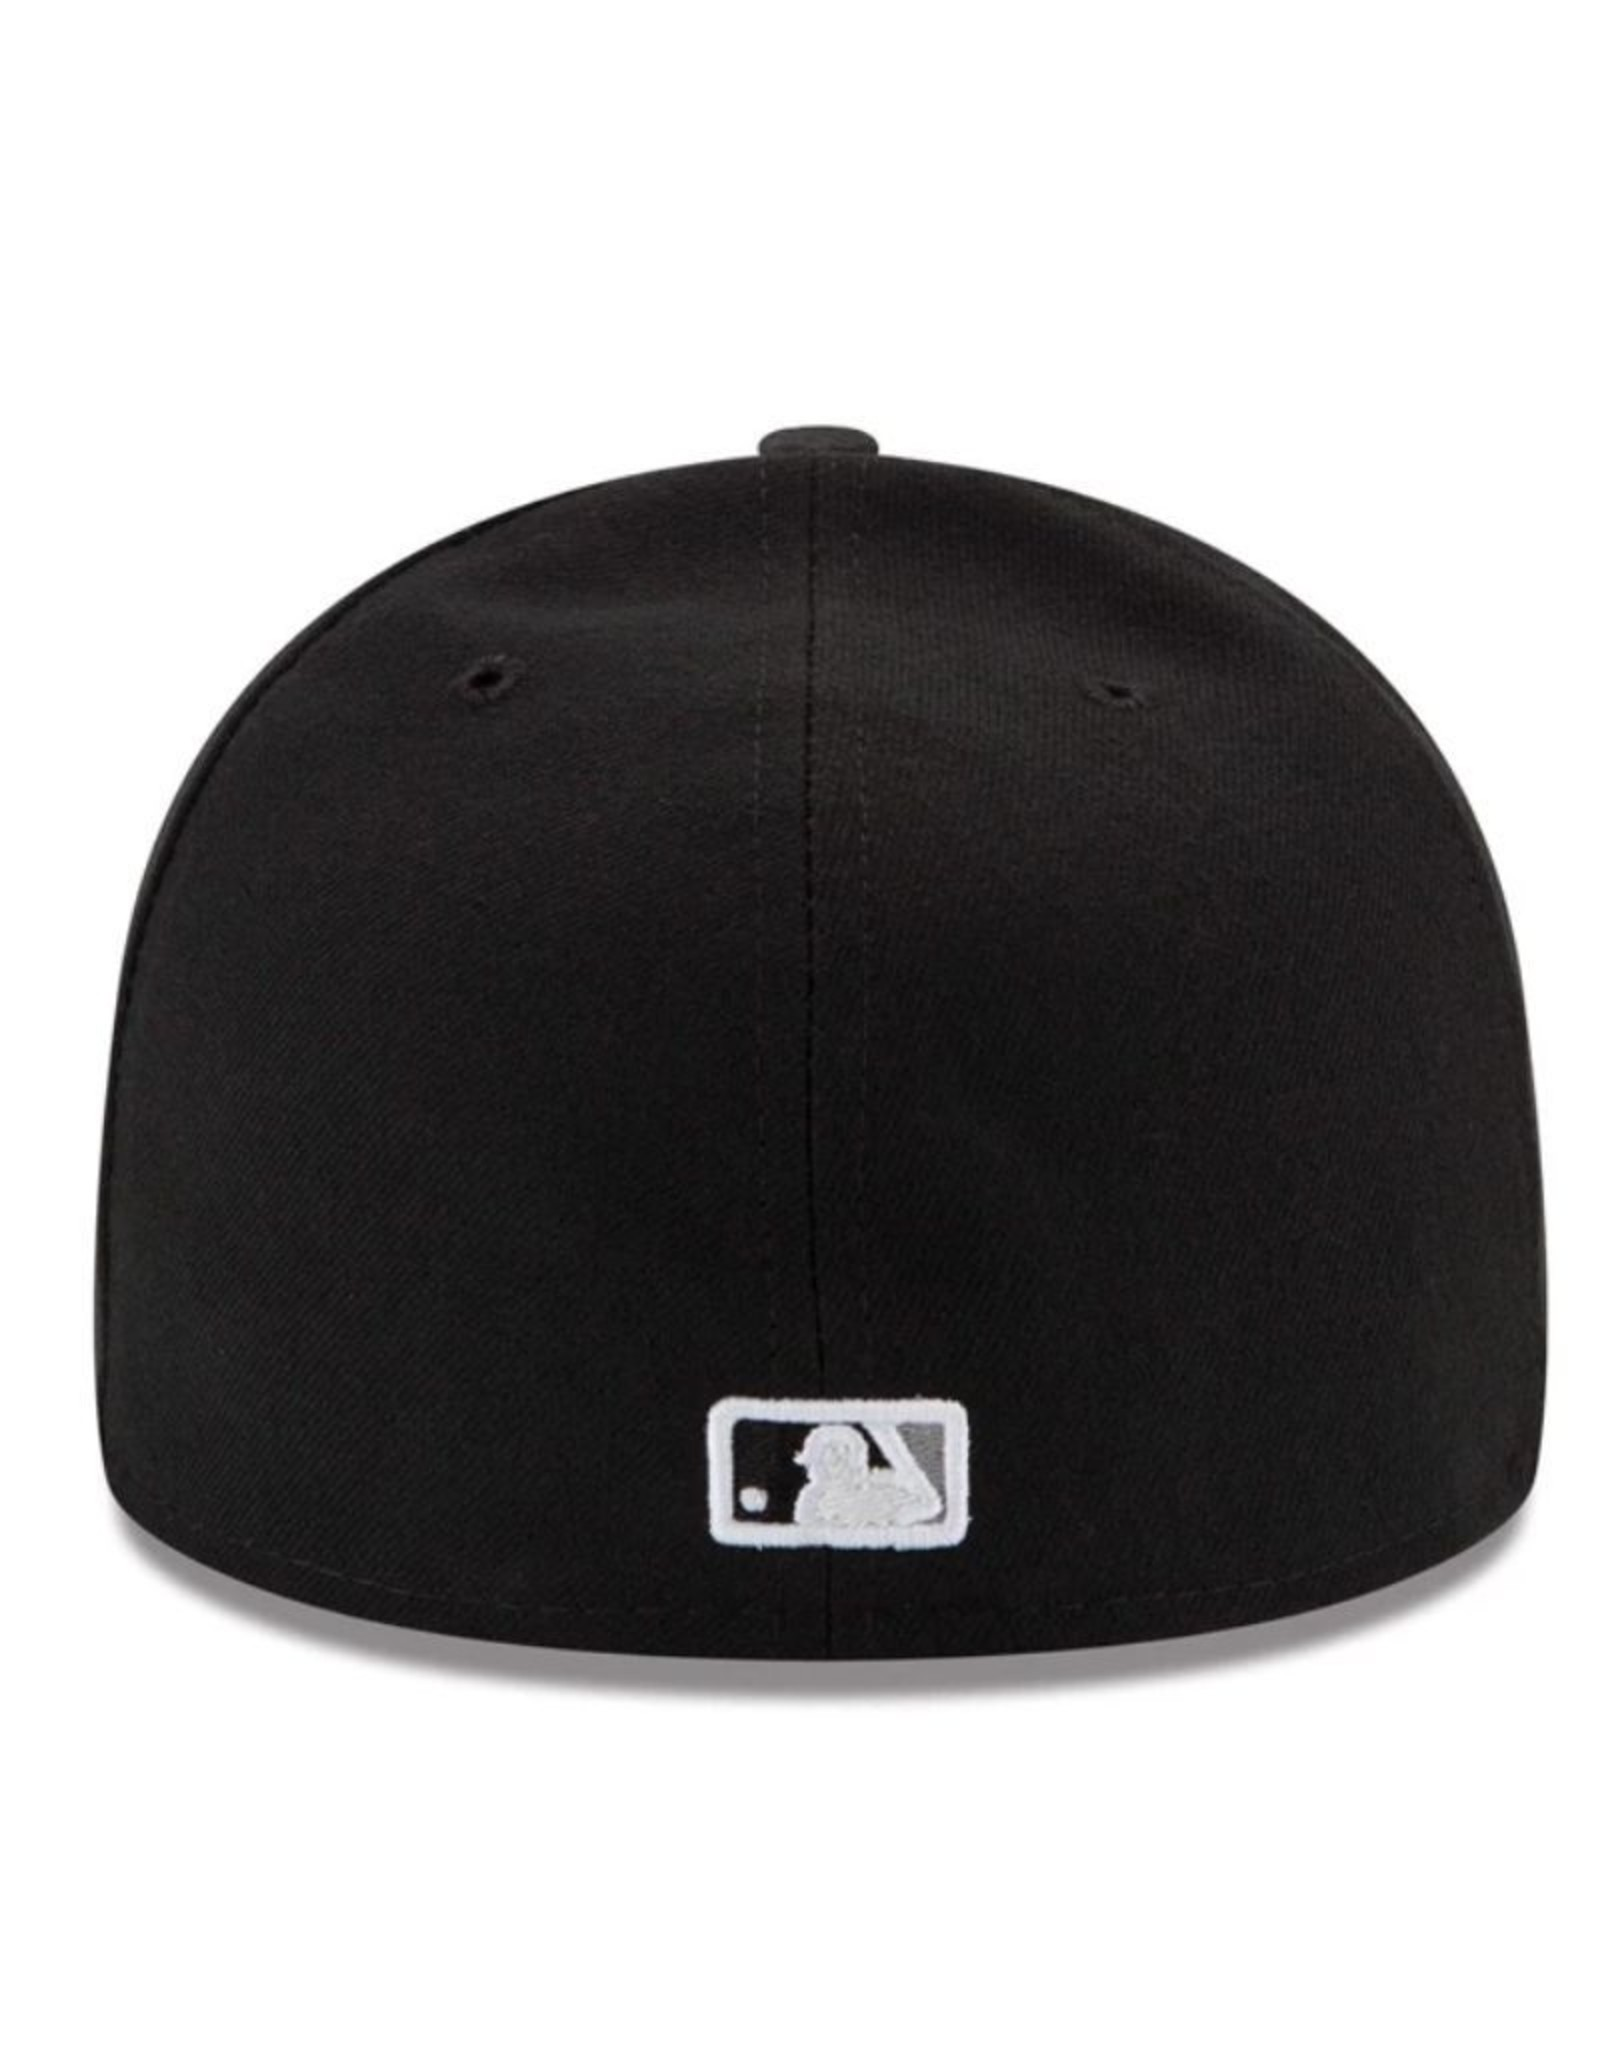 New Era On-Field Home Hat Chicago White Sox Black